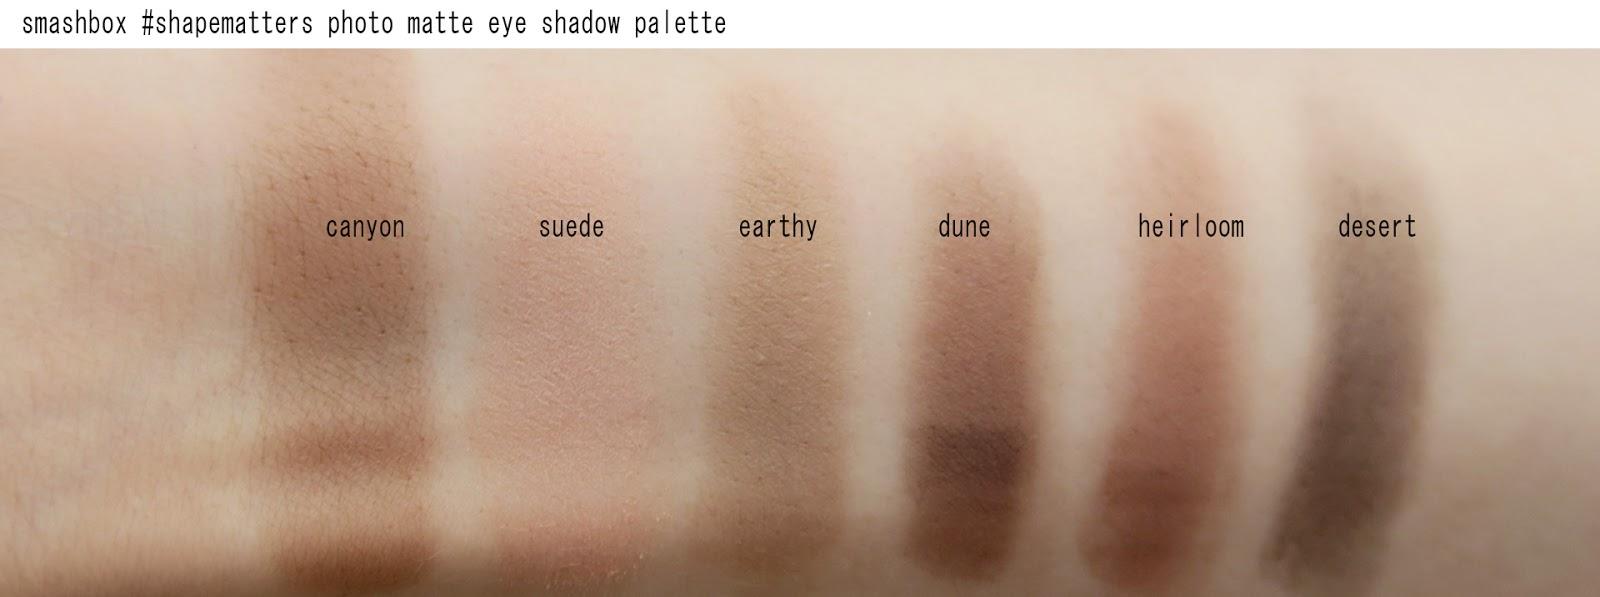 Smashbox Photo Matte Eye Palette Mascara Review Swatches